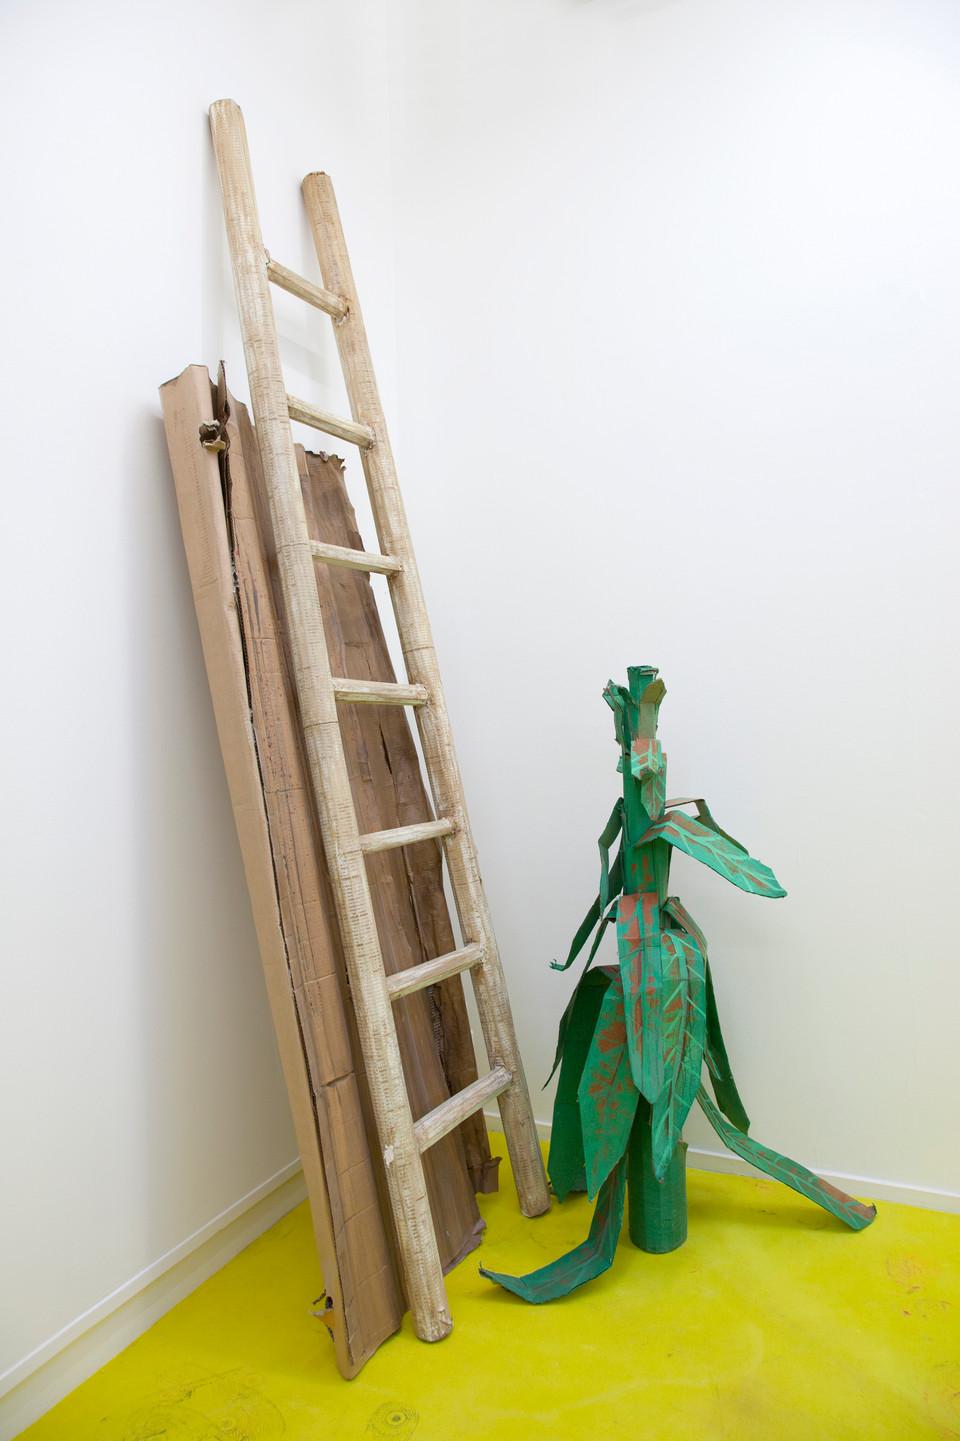 RINUS VAN DE VELDE,  Prop, Escape, Ladder, Plant & Board, 2017